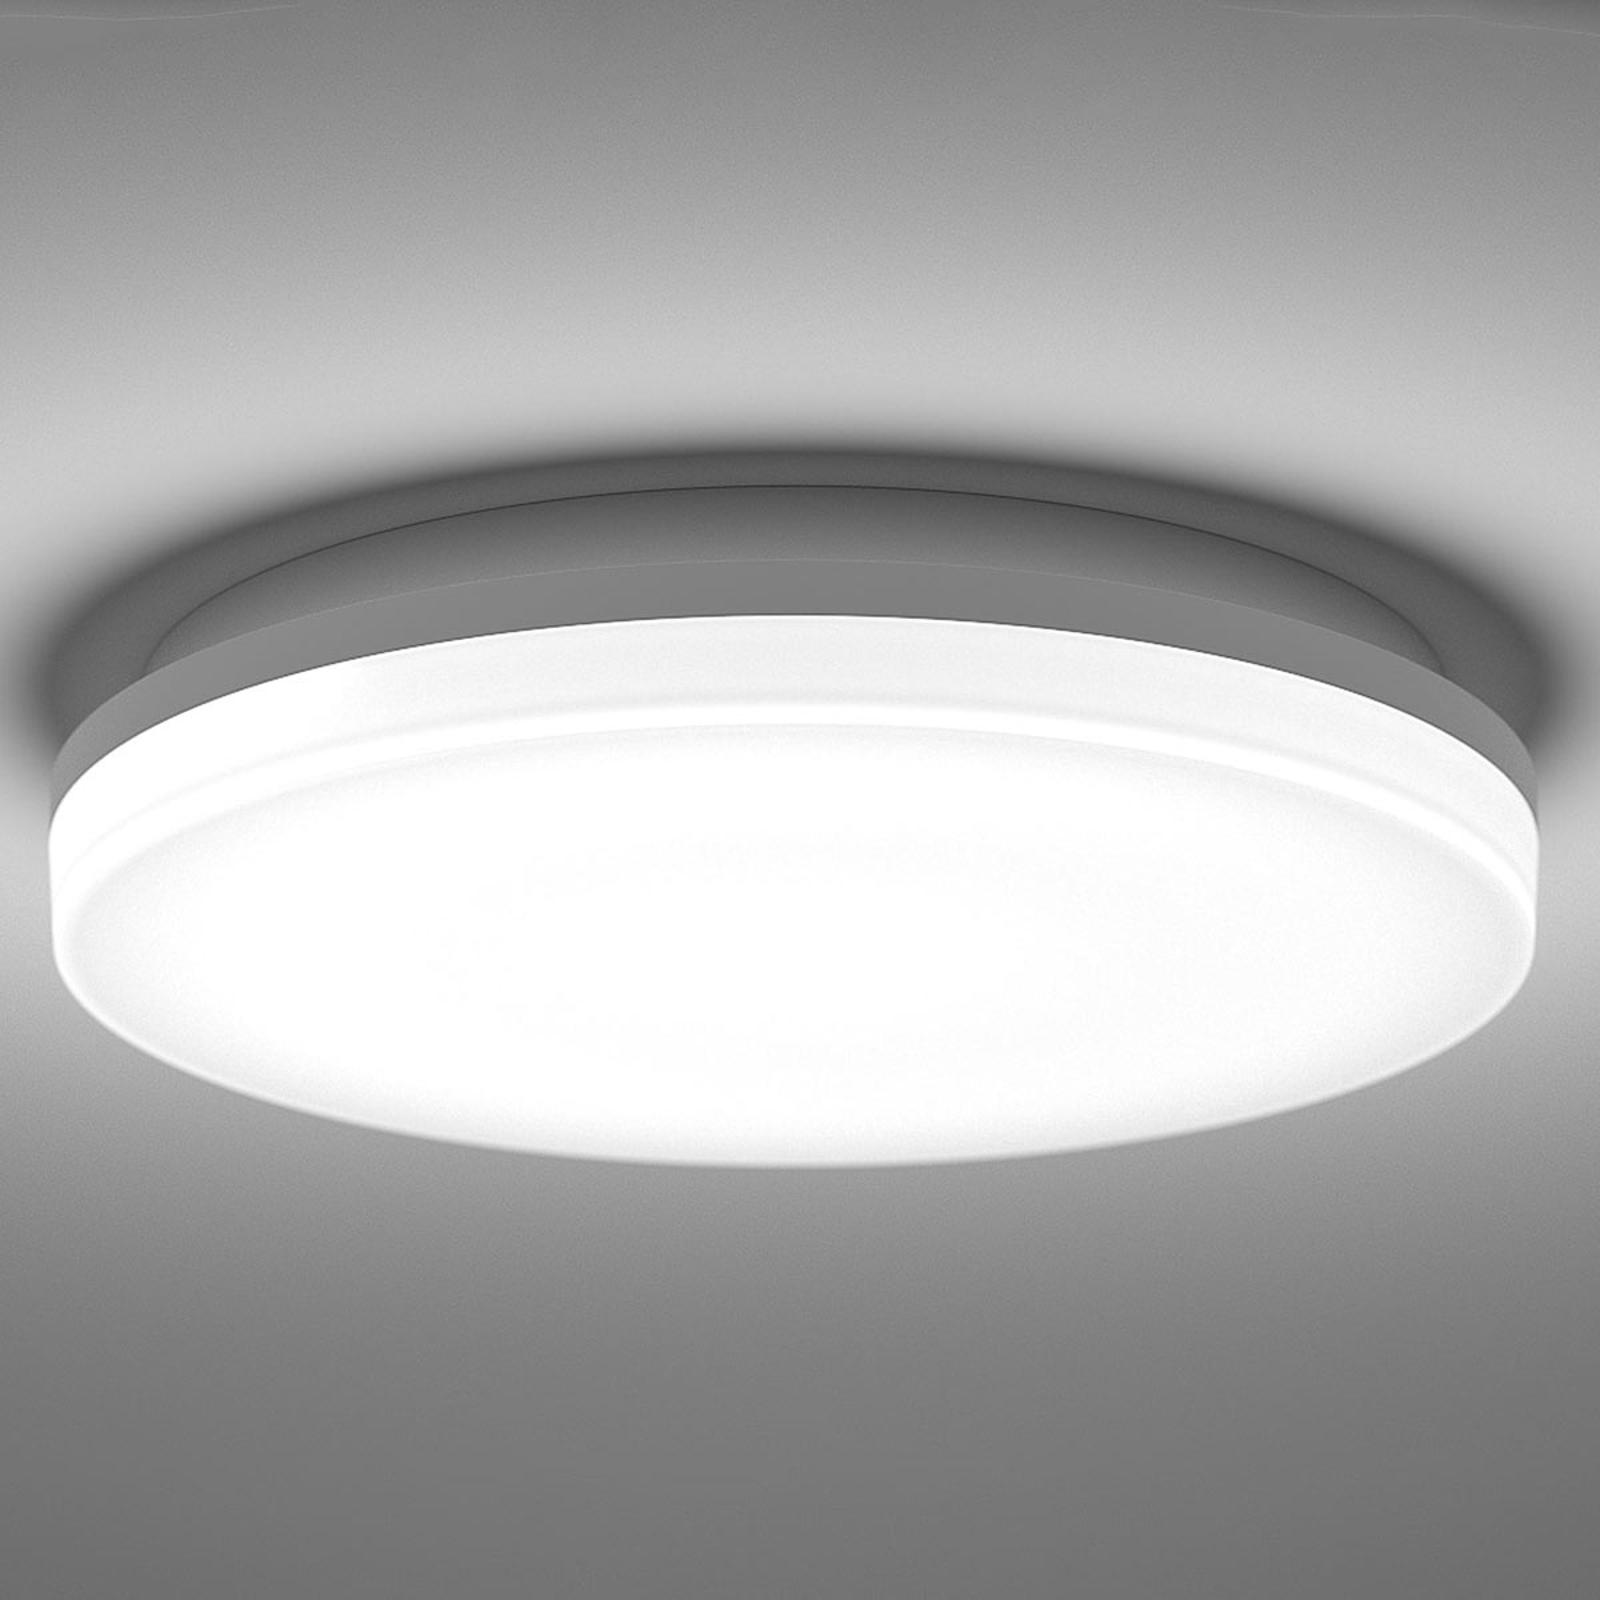 Regent Isigo lampa sufitowa LED DALI 35W Ø40cm